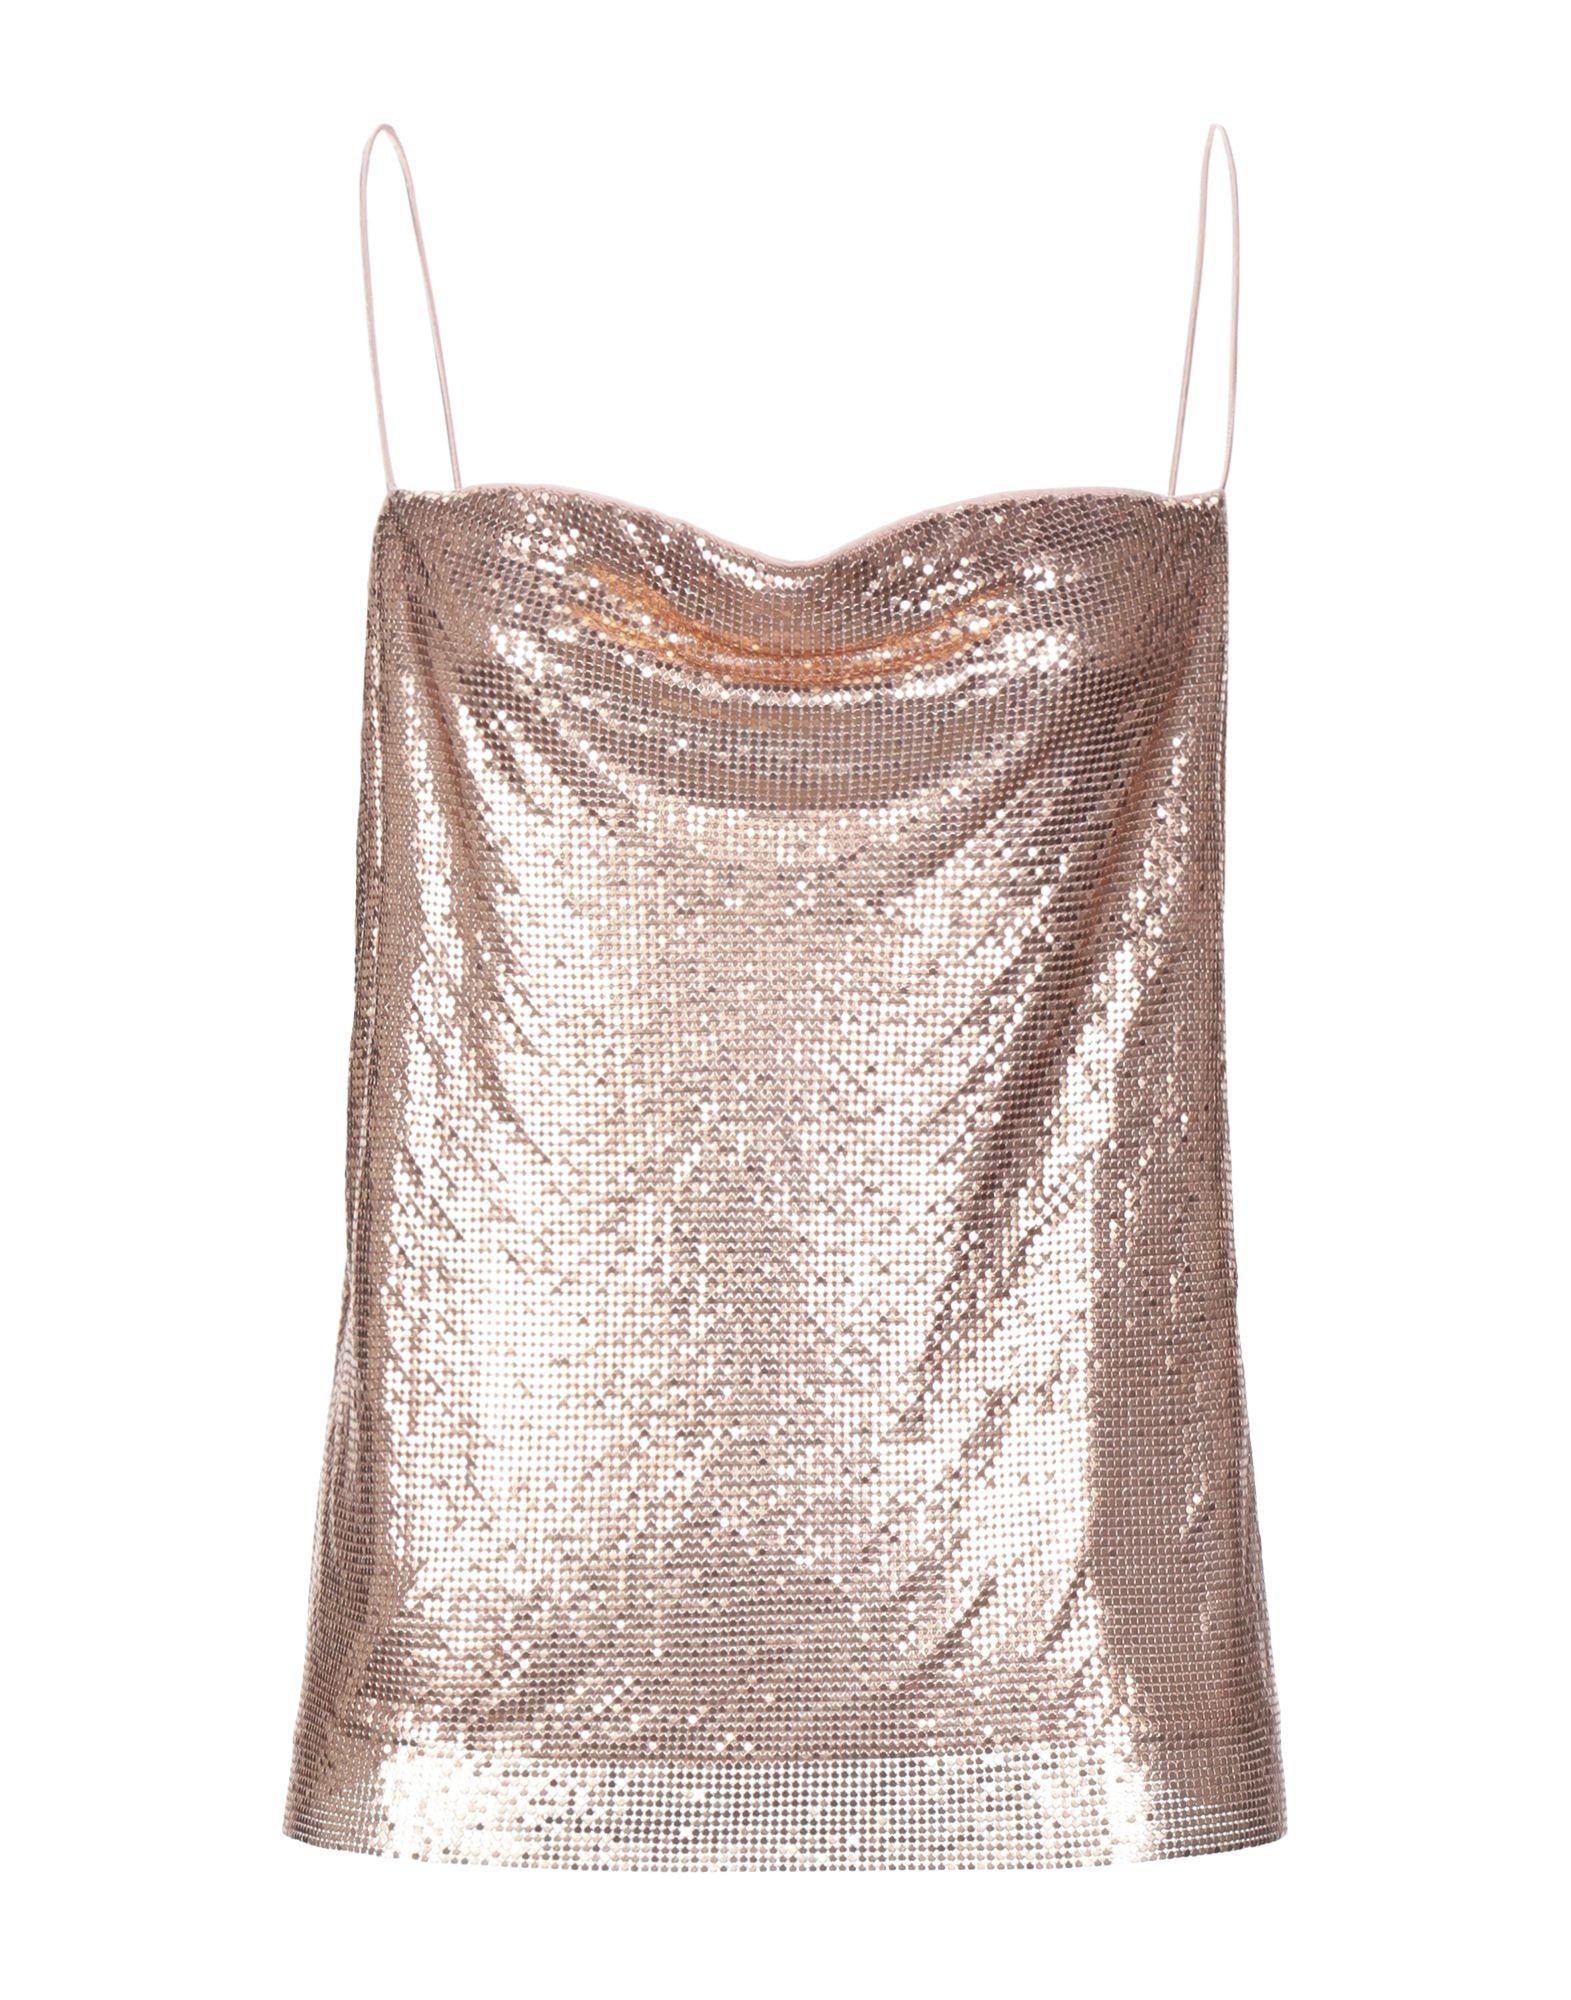 ALICE + OLIVIA Tops. no appliqués, solid color, wide neckline, sleeveless, no pockets, large sized. 100% Aluminum, Silk